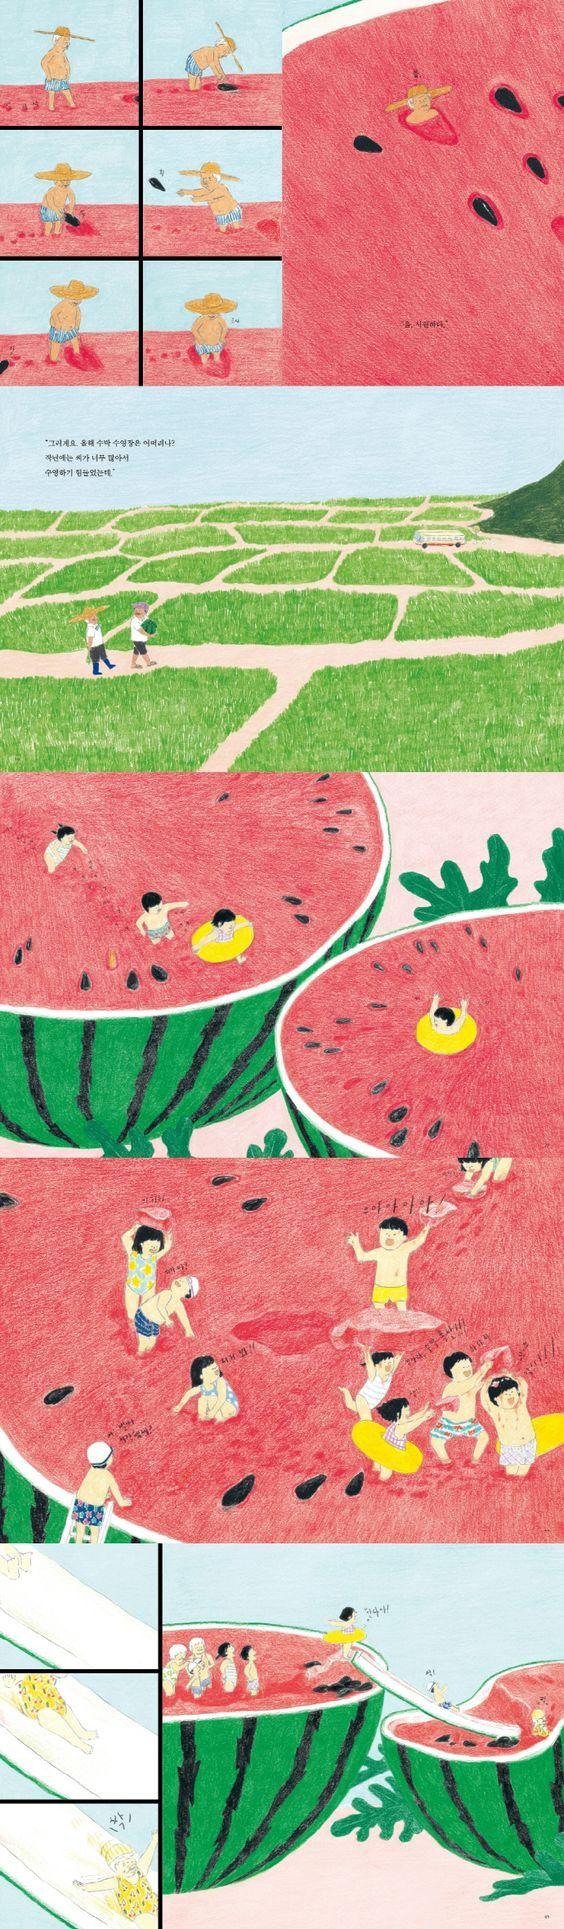 Watermelon swimming pool by Bonsoir lune: